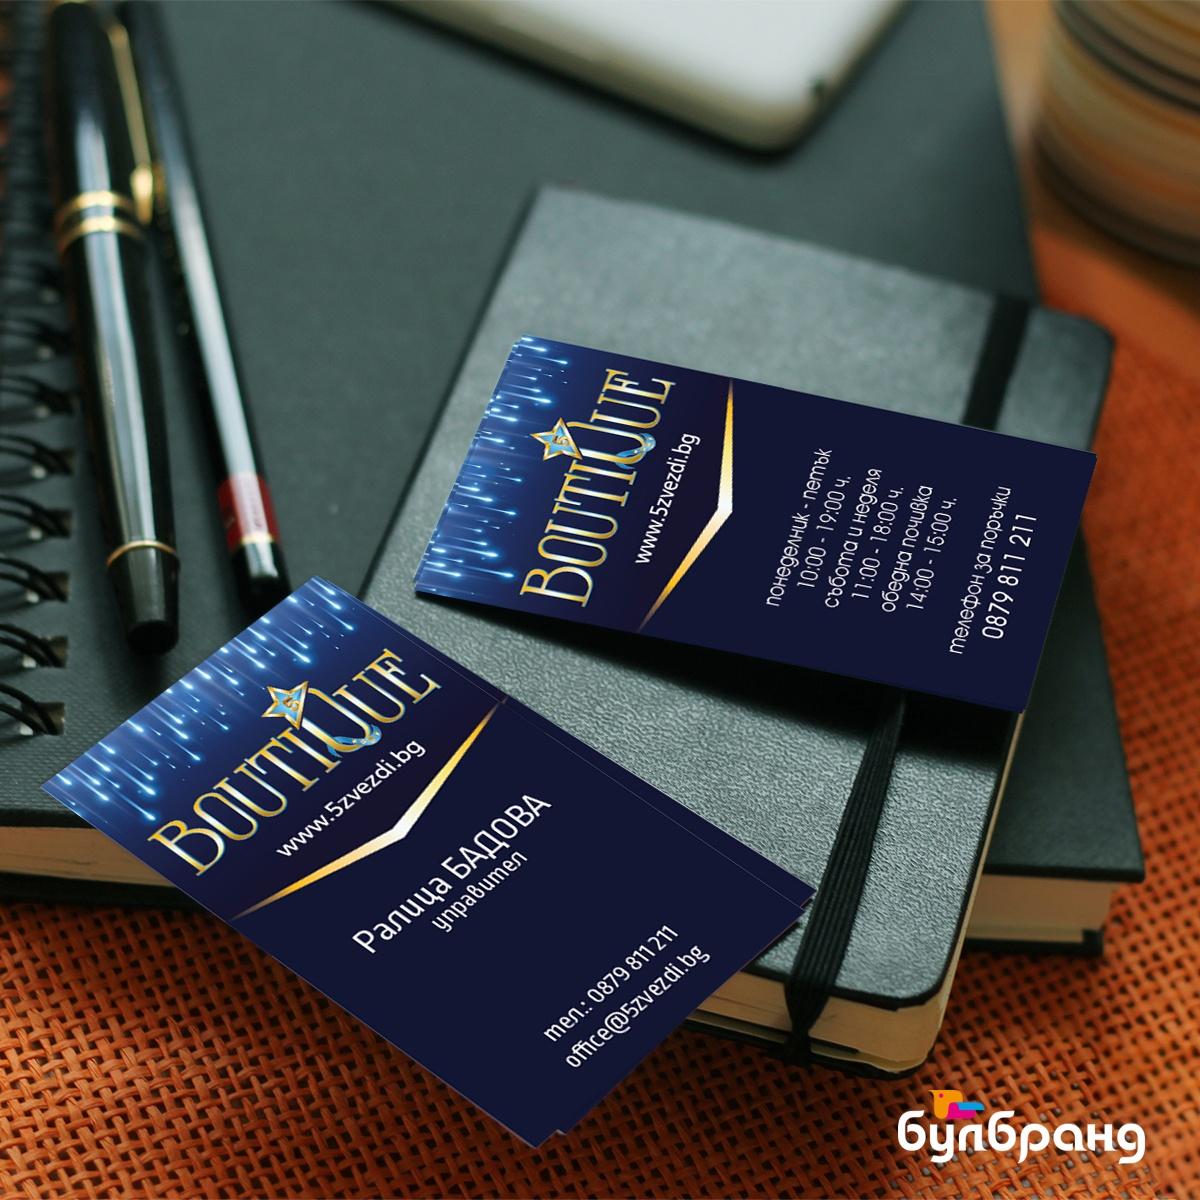 Двустранни визитки, Boutique 5 stars, Булбранд Медия